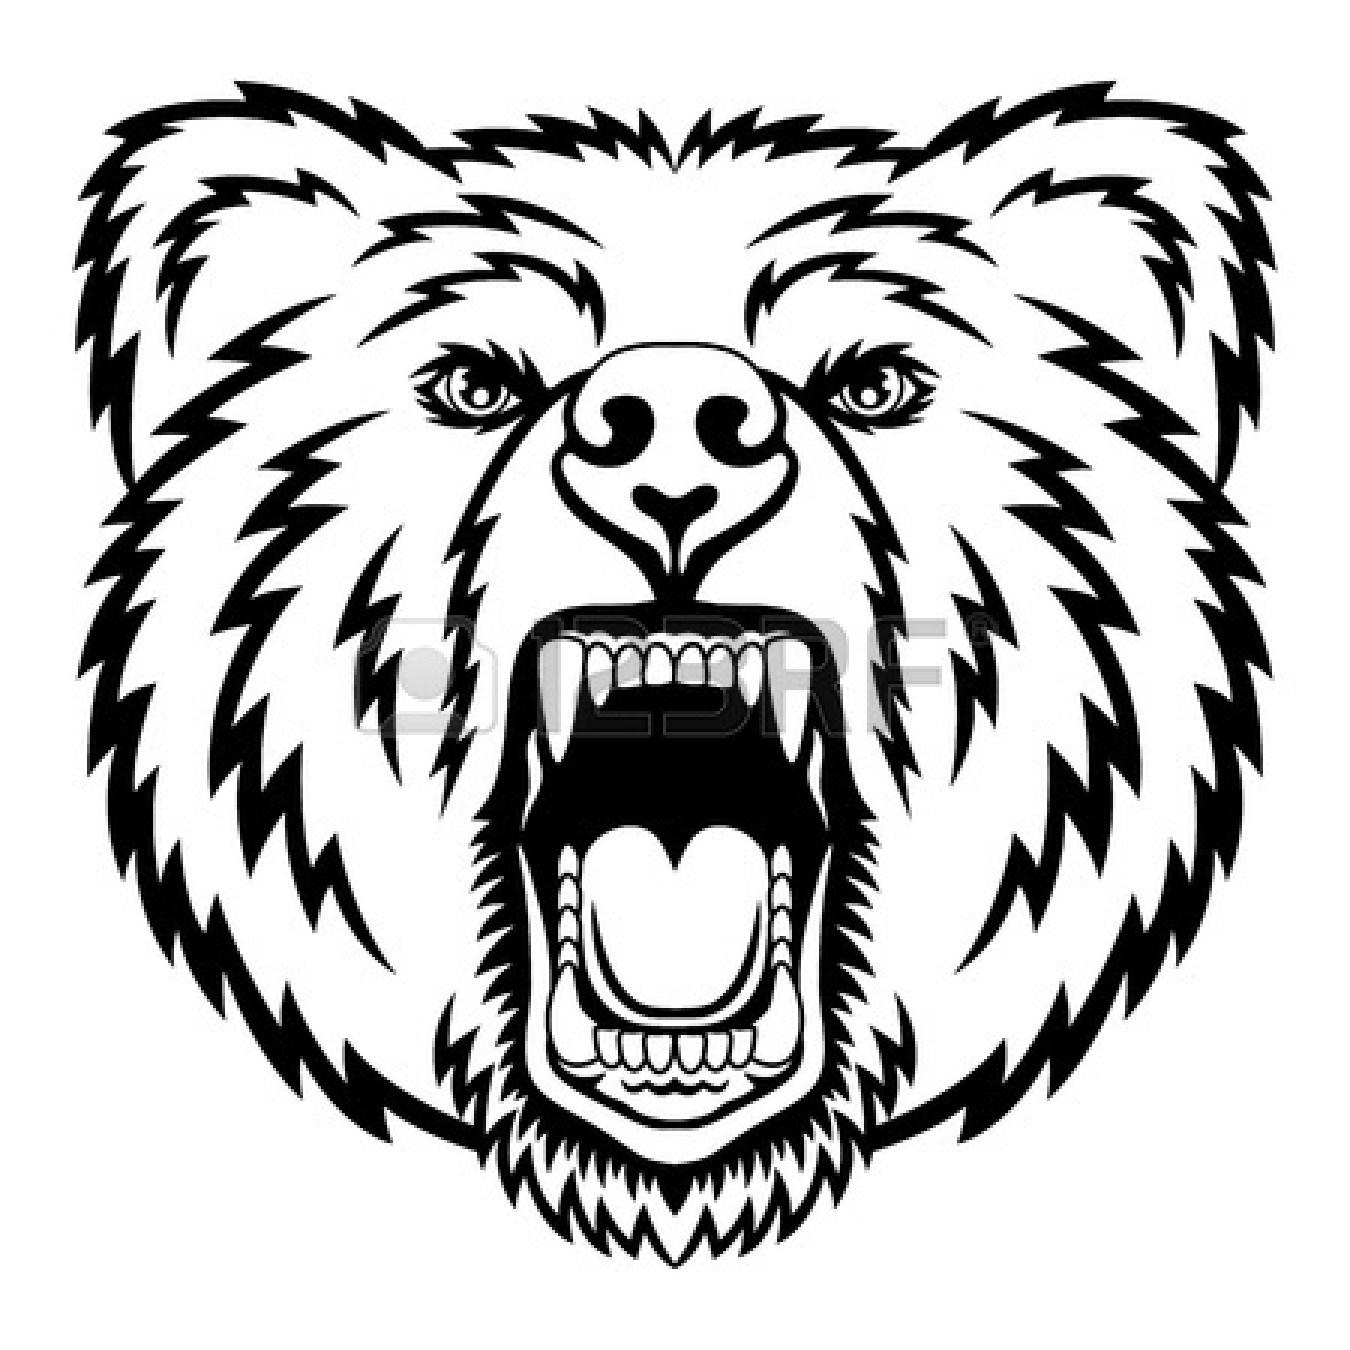 Bear mascot clipart image library stock Bear mascot clipart 8 » Clipart Portal image library stock